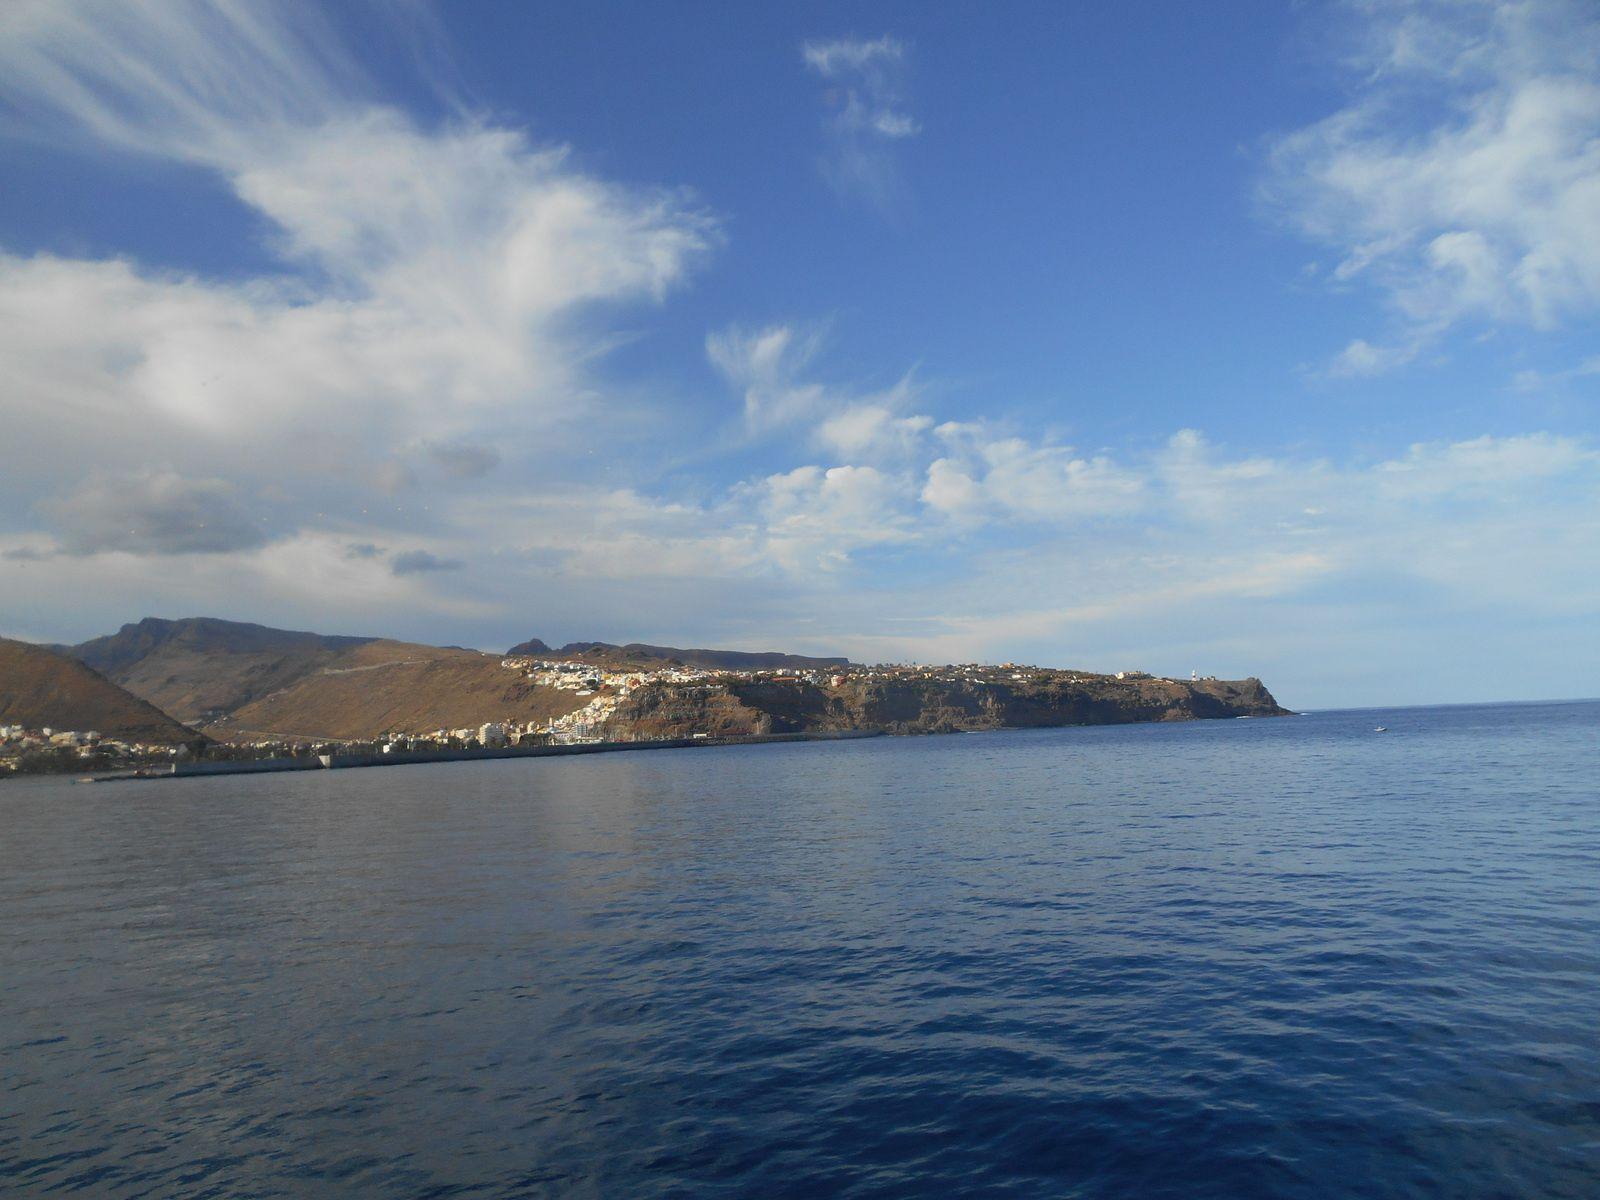 La côte de Ténérife, vers le port de Los Cristianos.